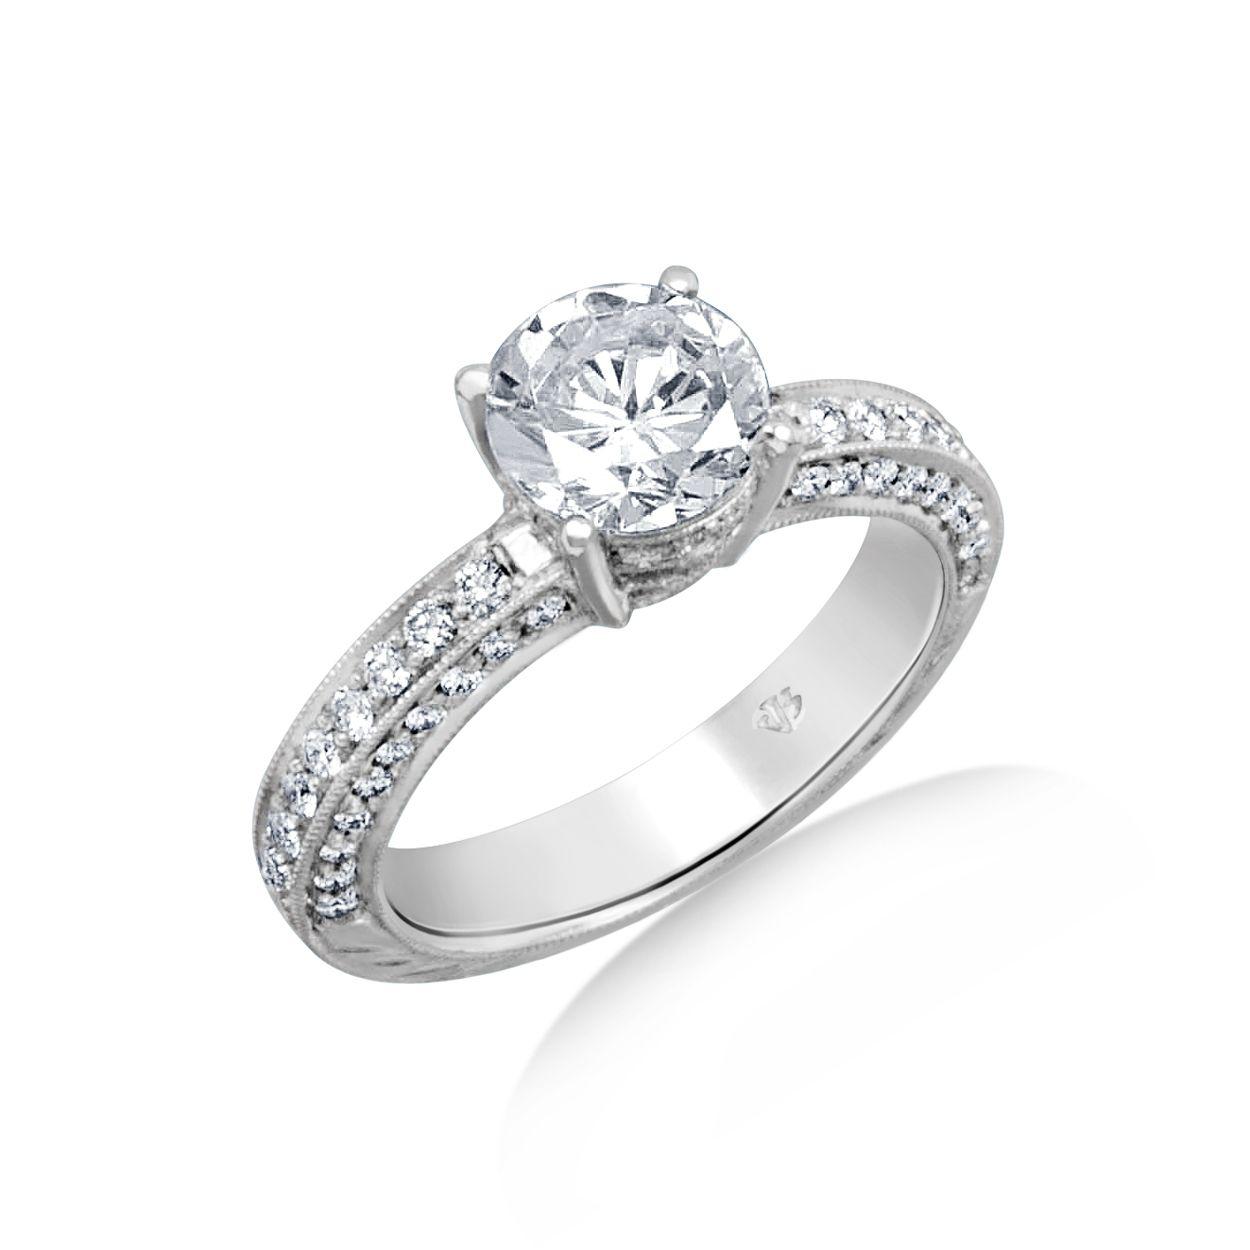 Chicago Bridal Marshall Pierce Company Jack Kelege Diamond